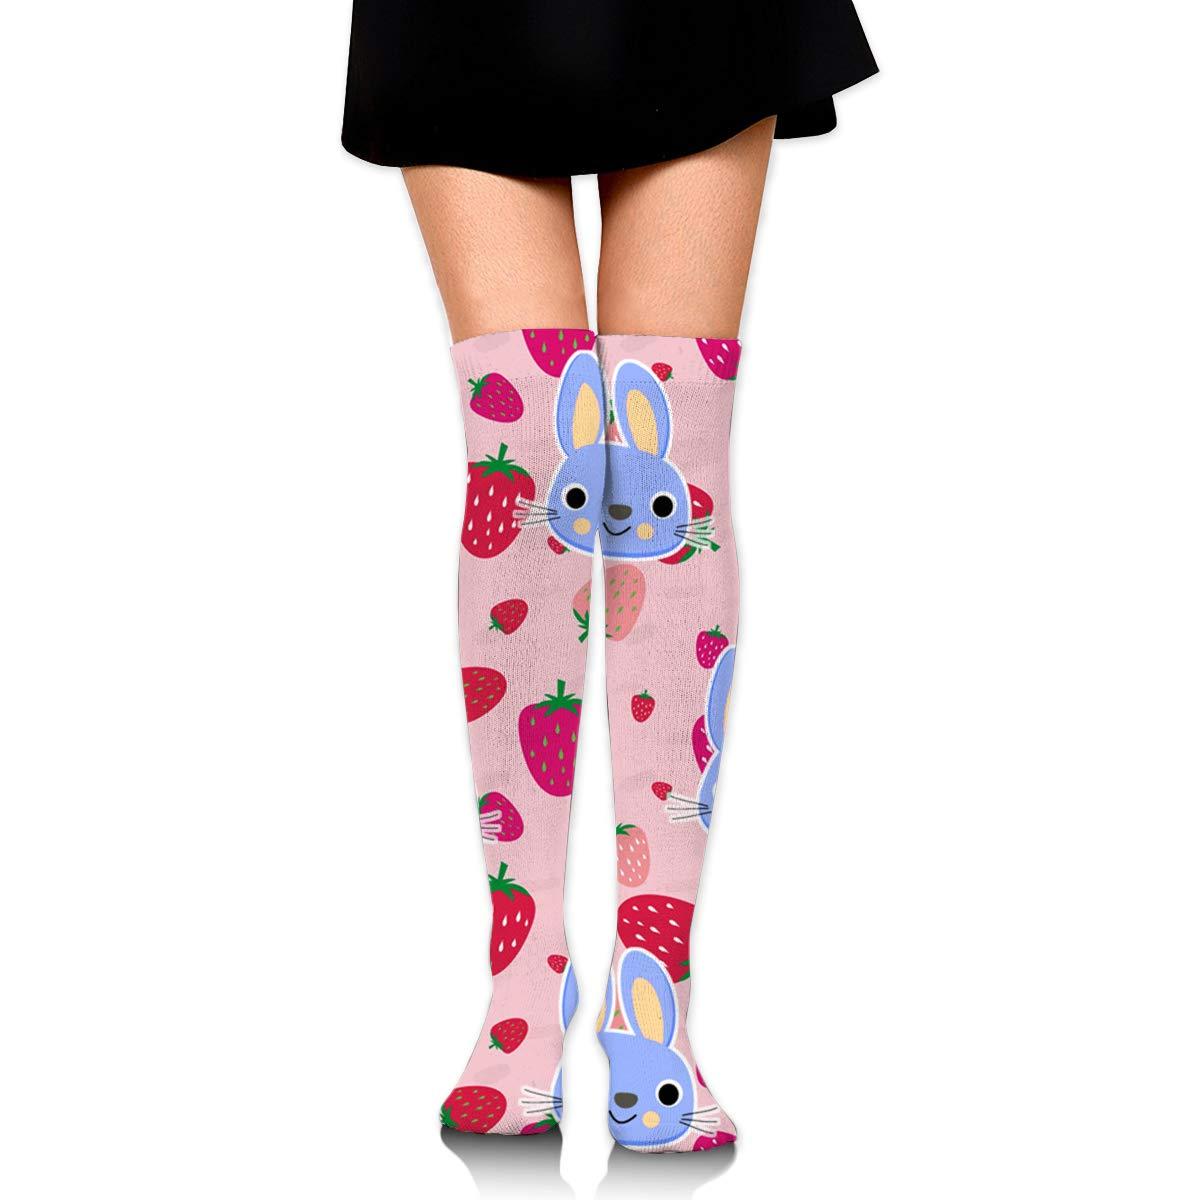 Light Venus Strawberry Rabbit Womens Ladies Cotton Long Knee Knee High Socks